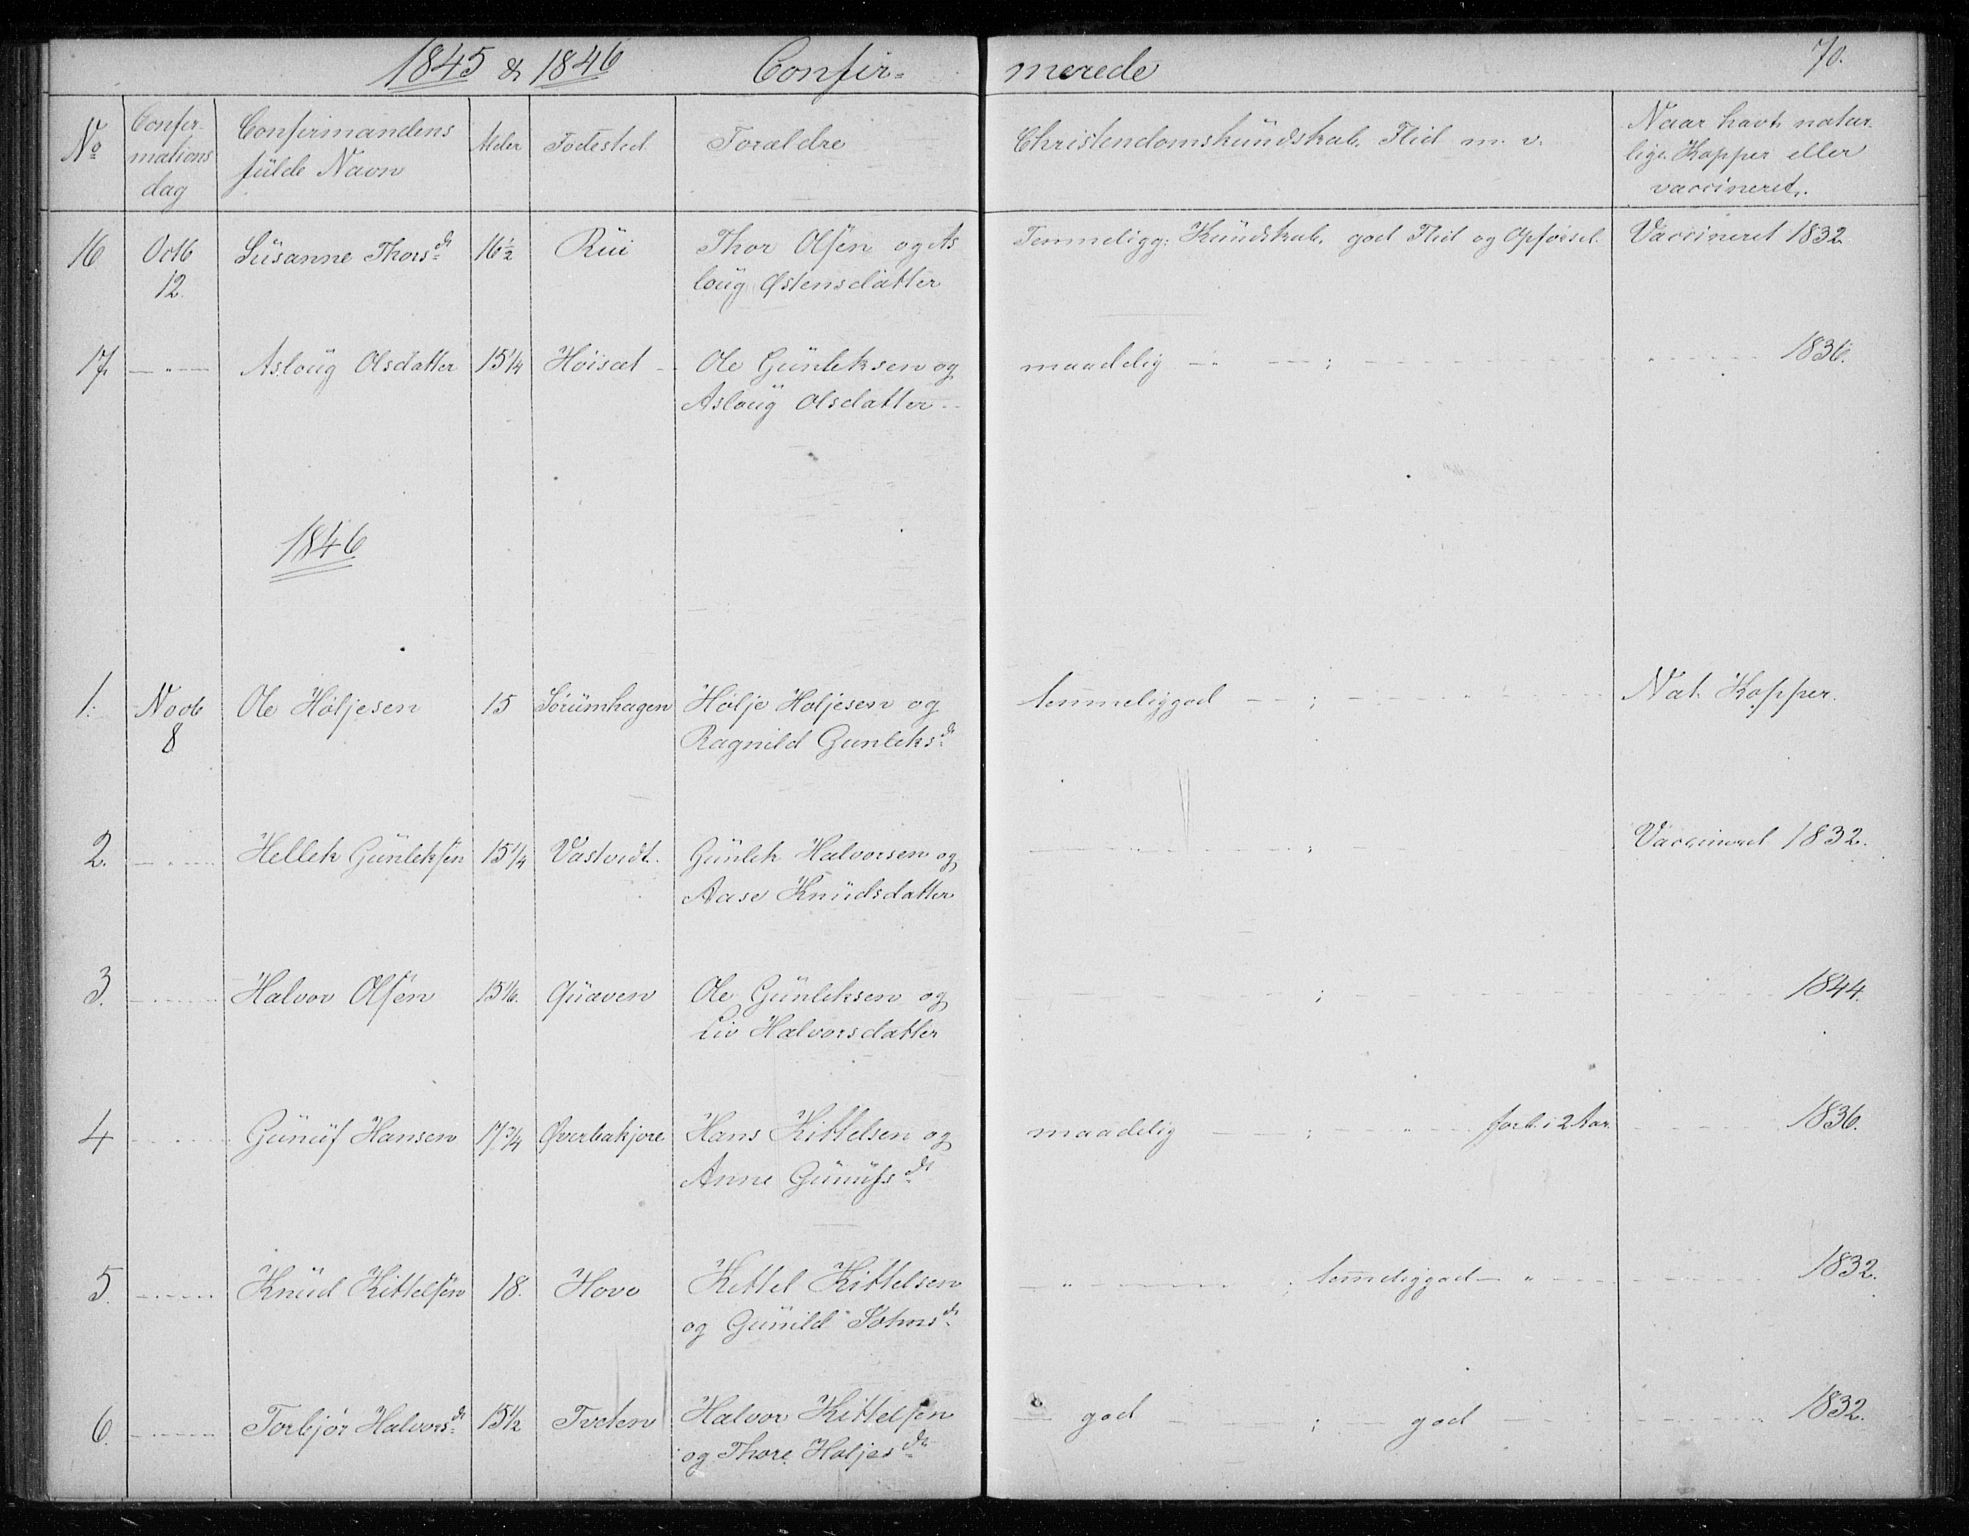 SAKO, Gransherad kirkebøker, F/Fb/L0003: Ministerialbok nr. II 3, 1844-1859, s. 70